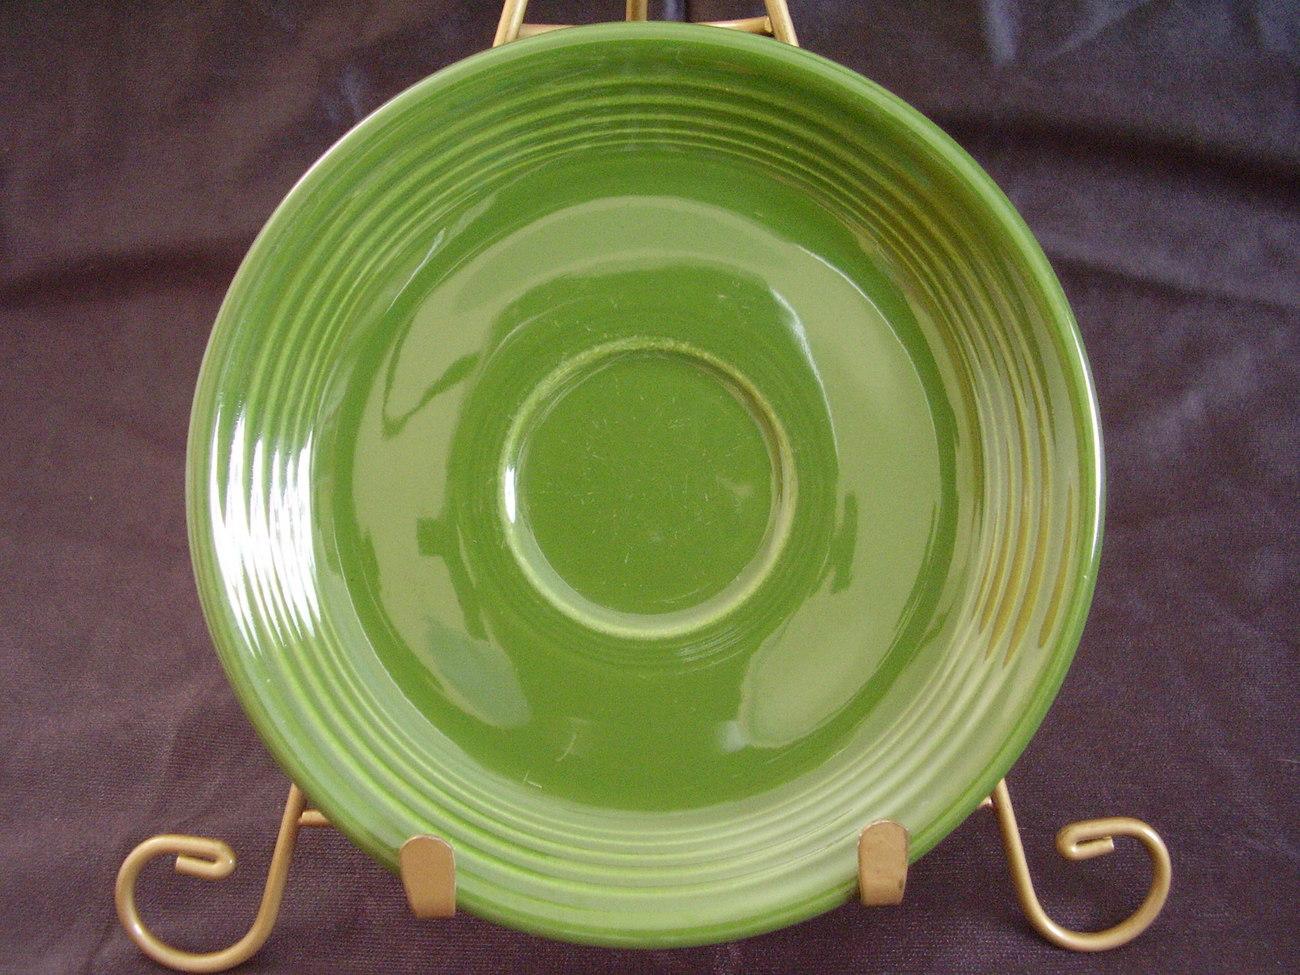 Vintage Fiestaware Forest Green Teacup Saucer Fiesta C